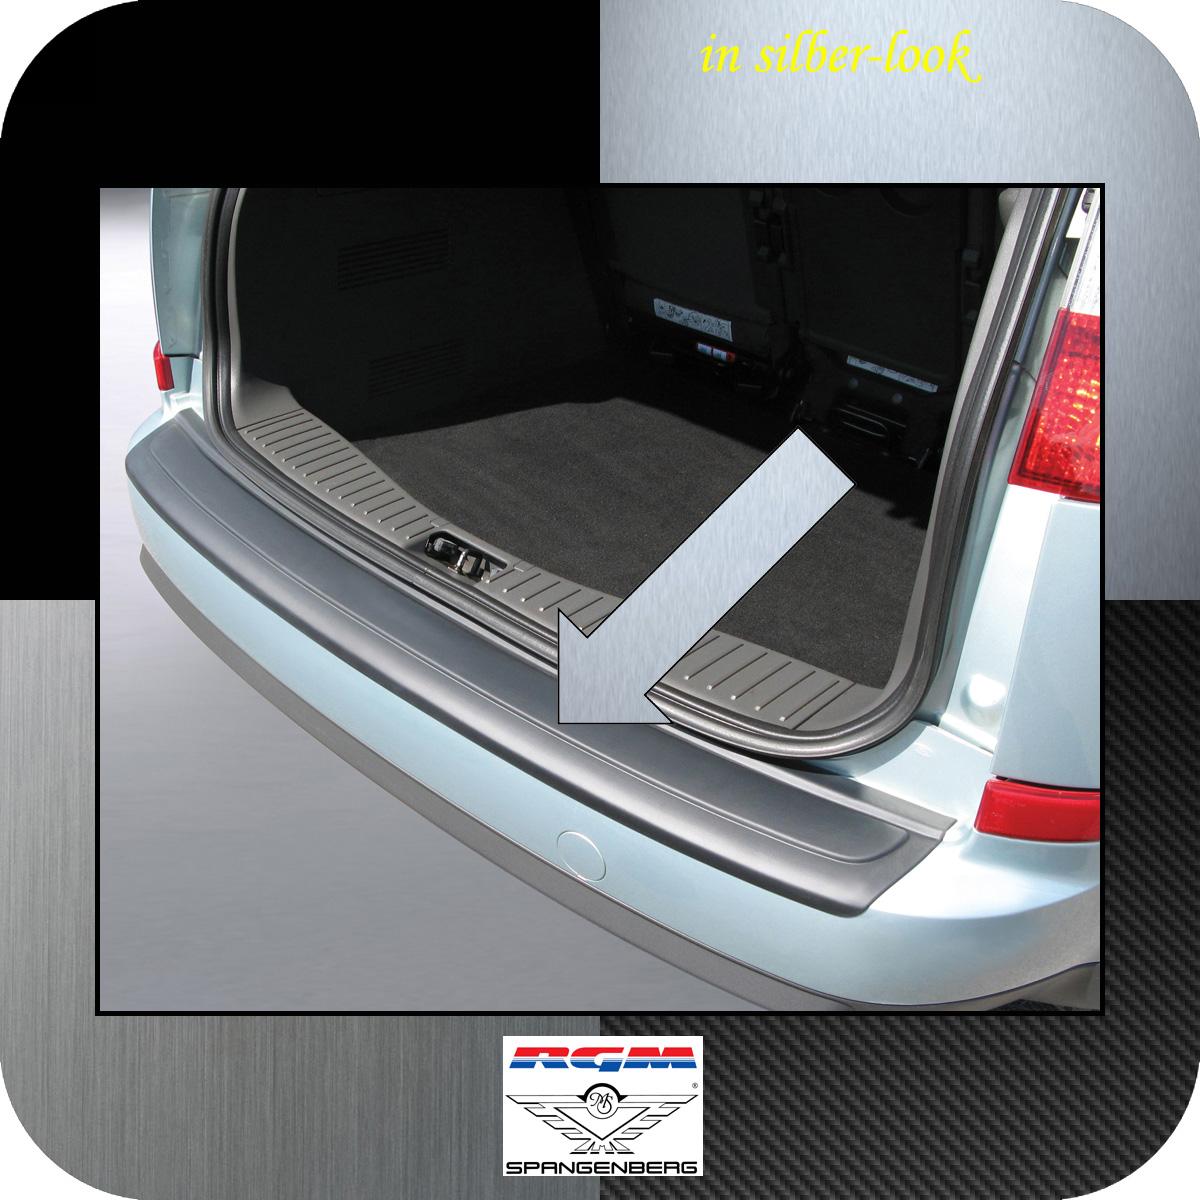 Ladekantenschutz Silber-Look Ford C-MAX I Van Kombi ab facelift 2007-10 3506175